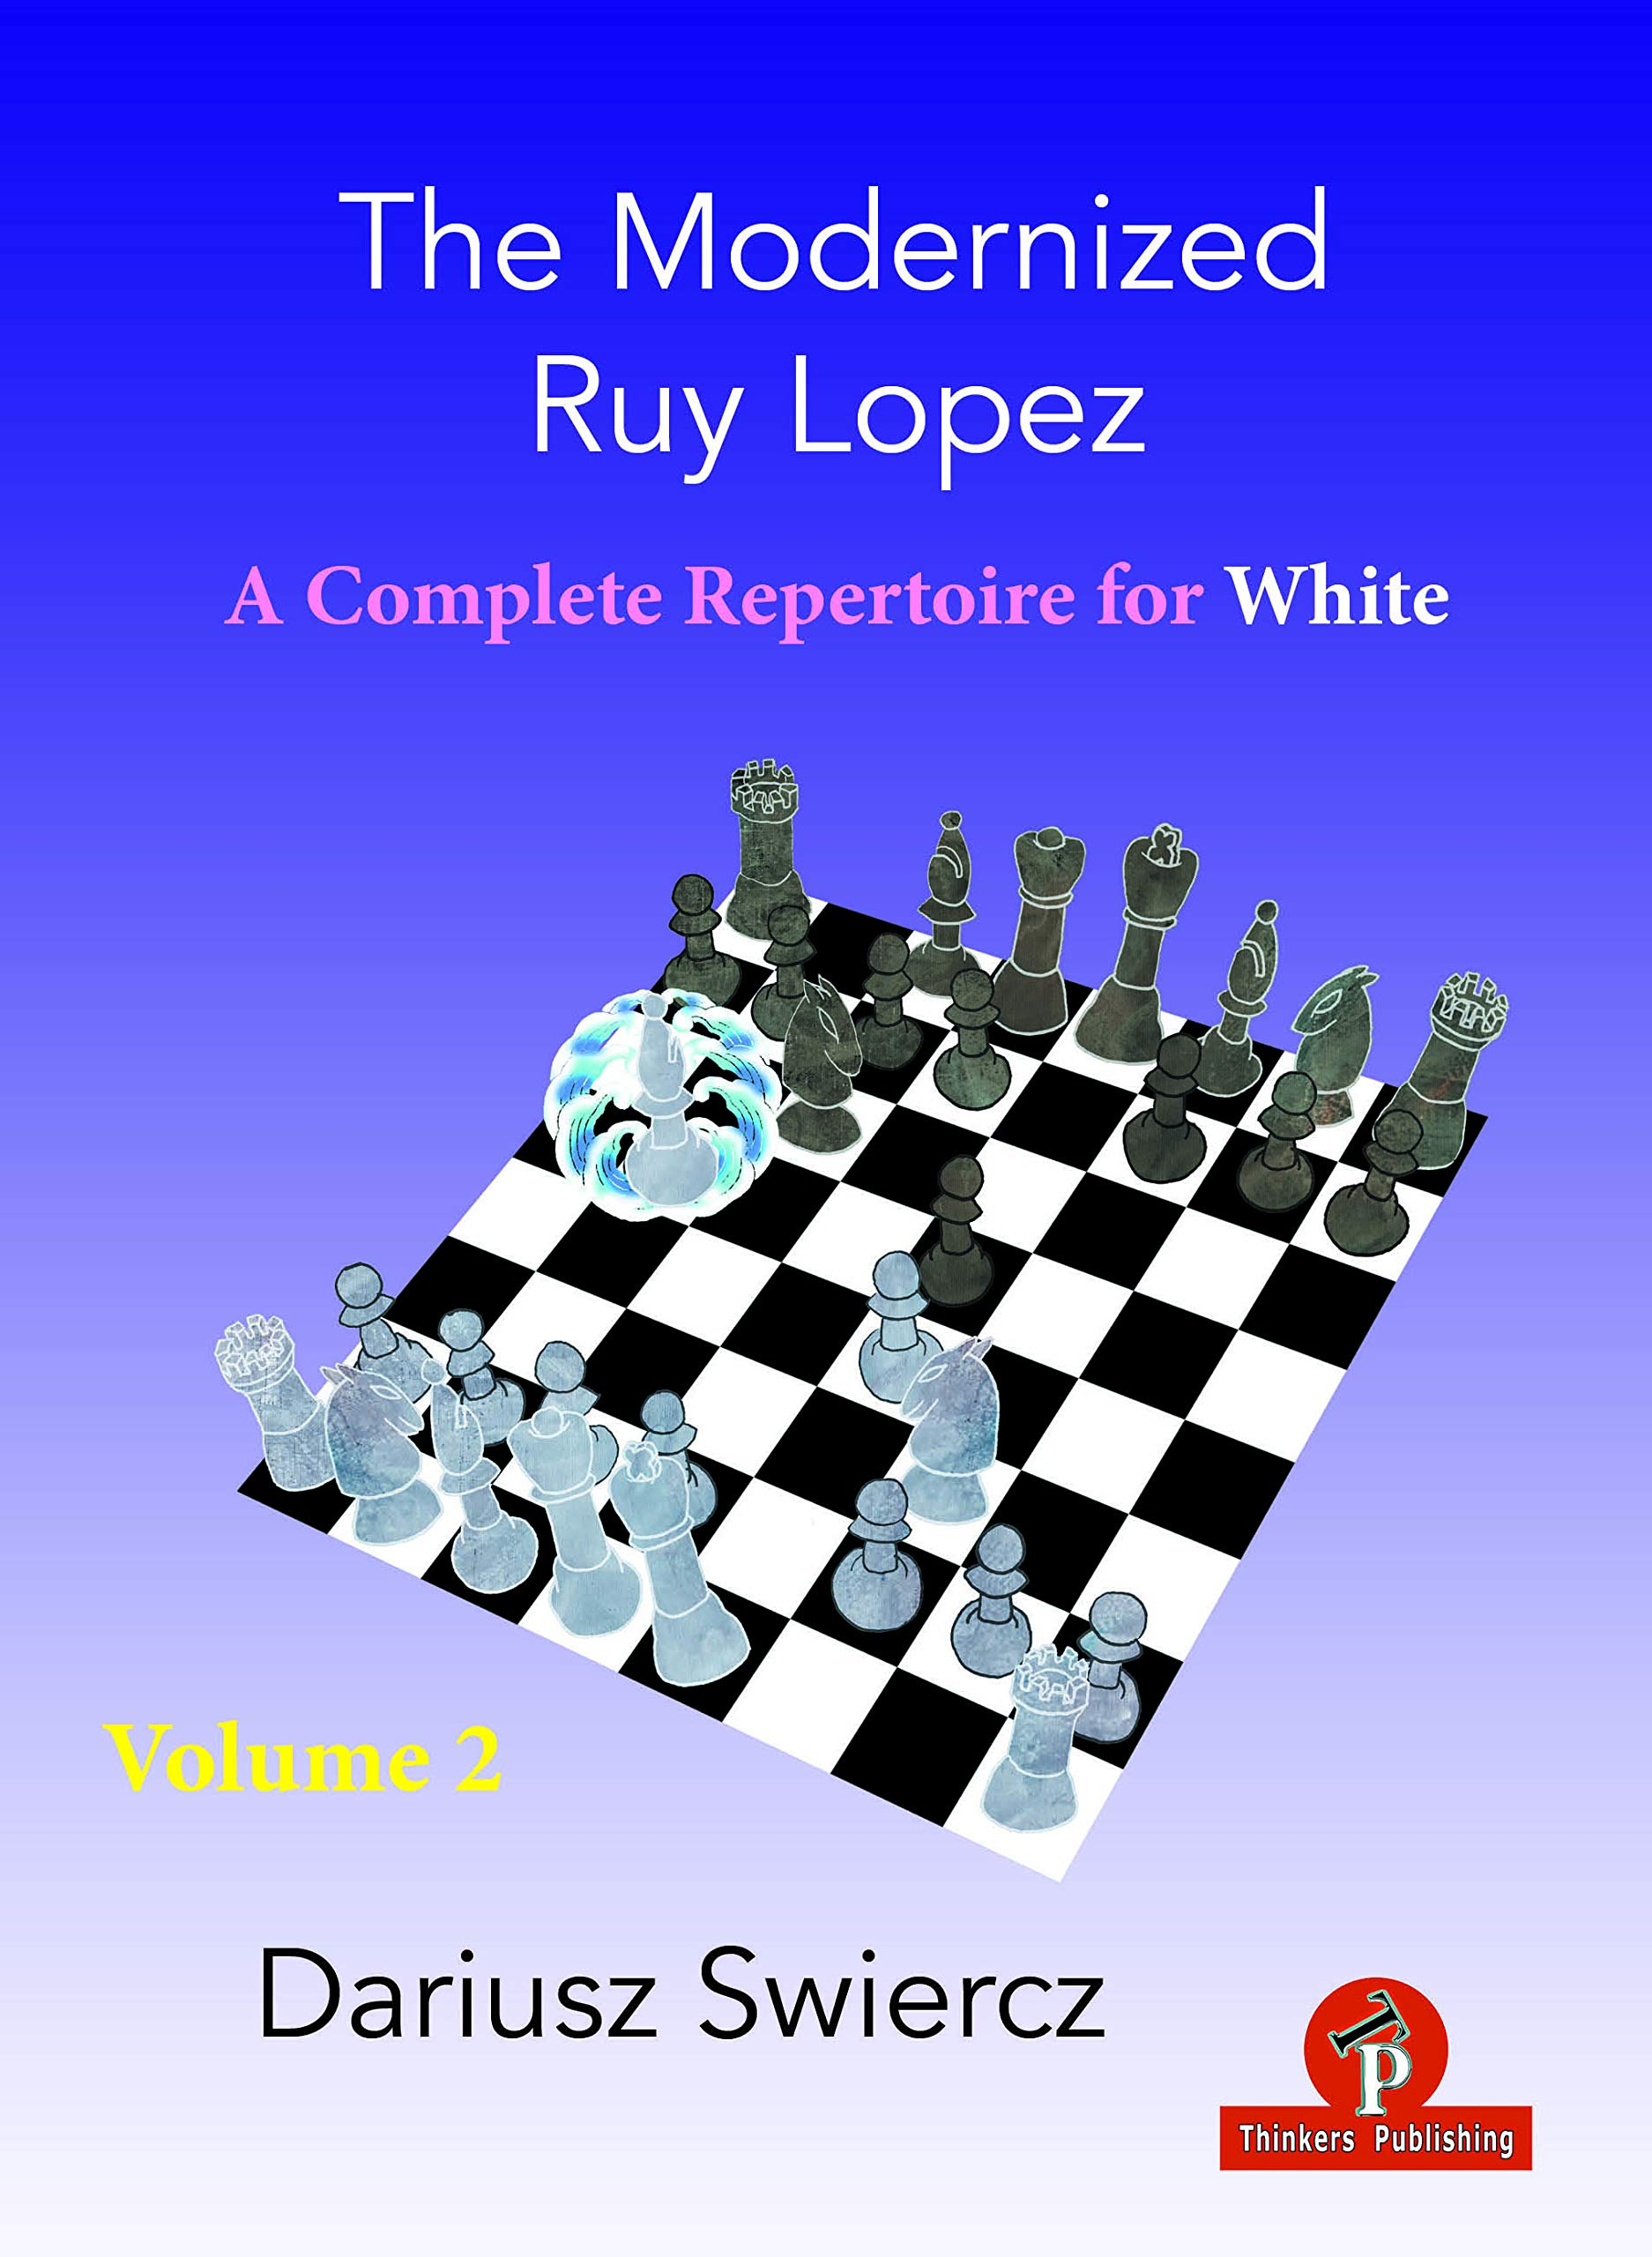 The Modernized Ruy Lopez – Volume 2 – A Complete Repertoire for White, Dariusz Swiercz, Thinkers Publishing, ISBN 978-9464201086